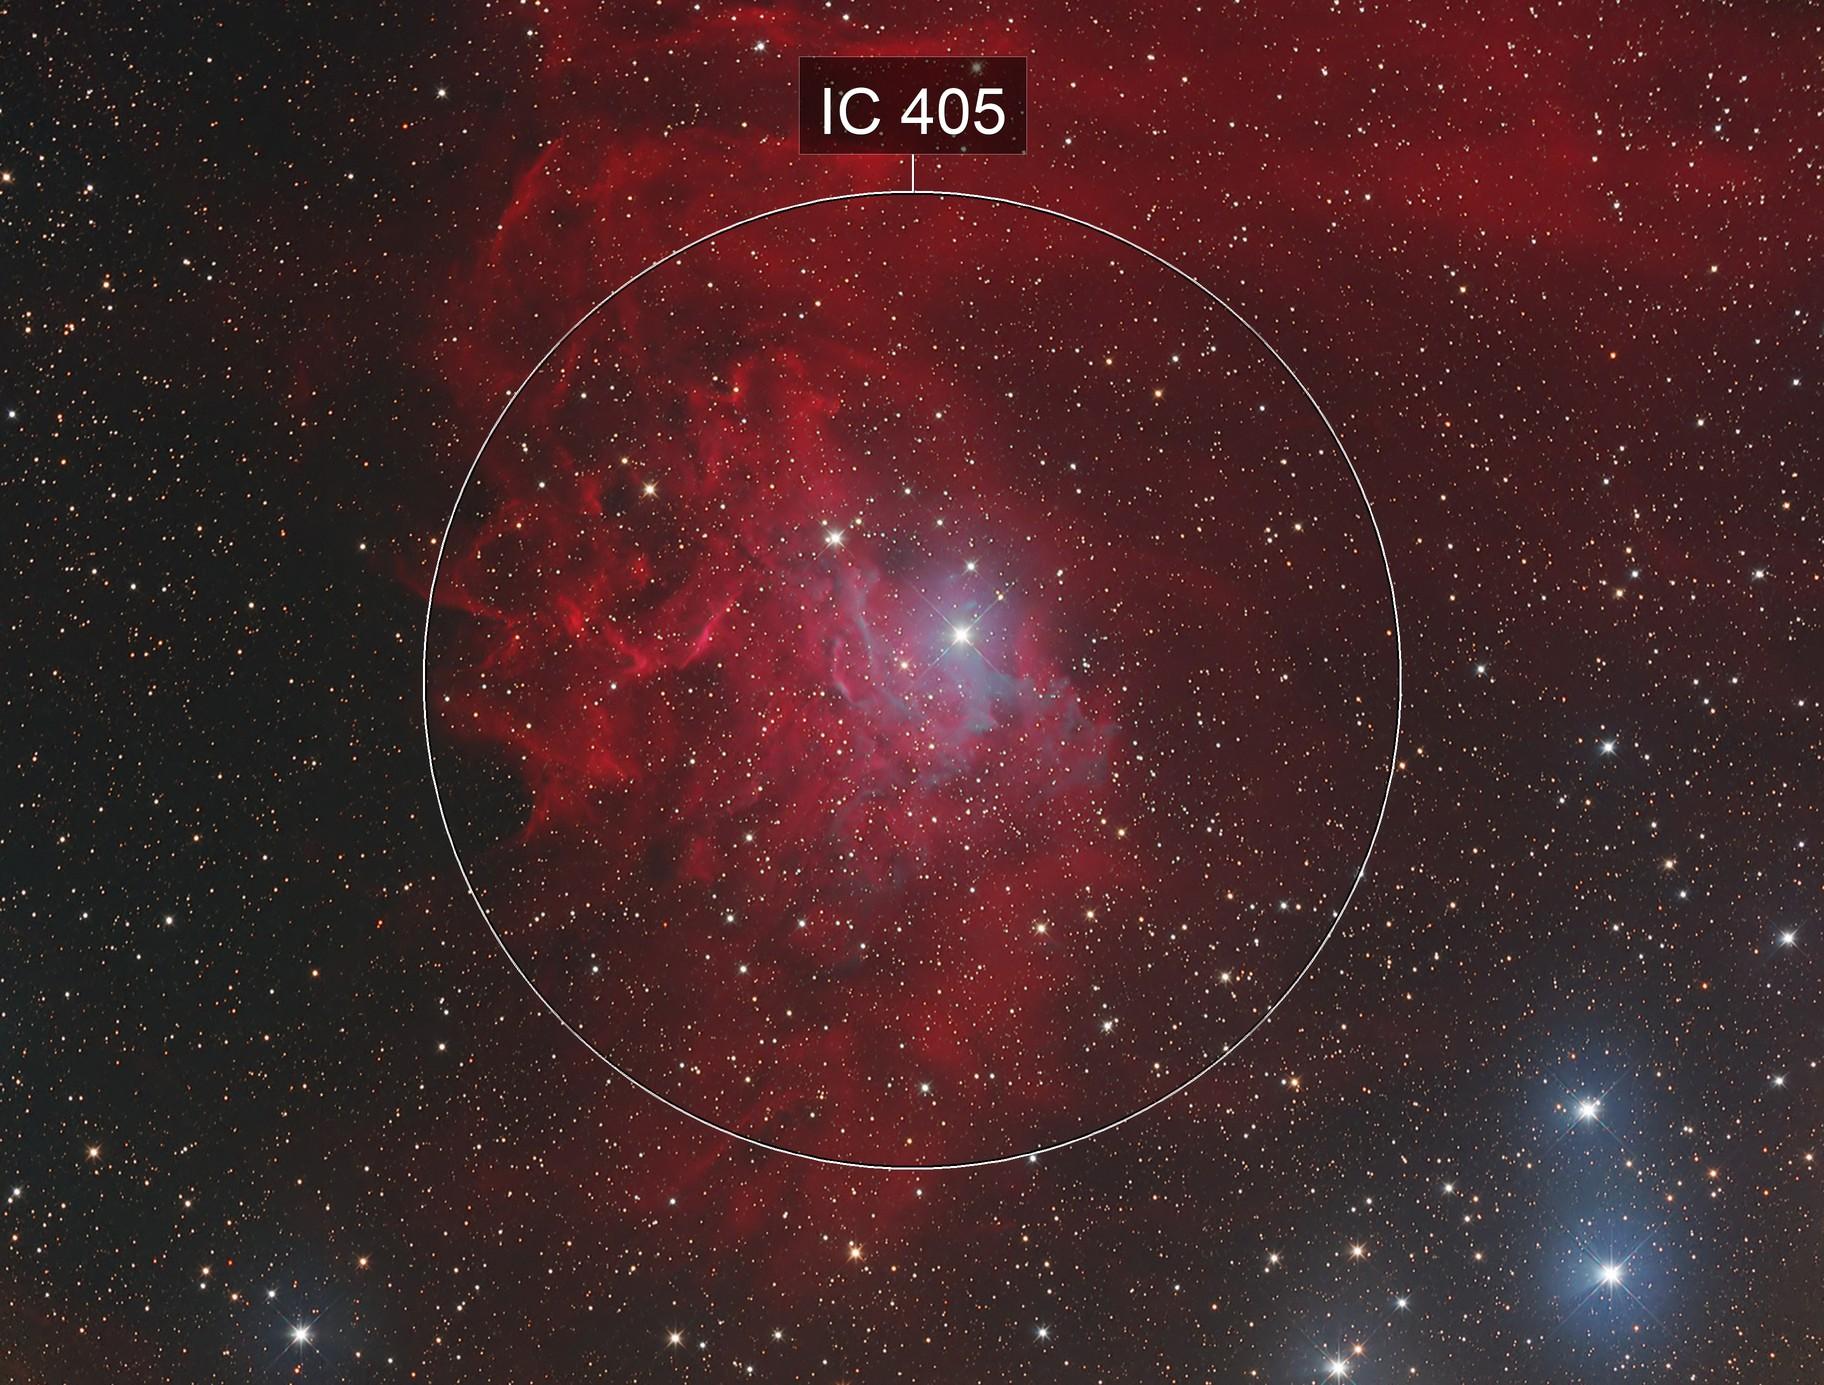 IC 405 the Flaming Star nebula